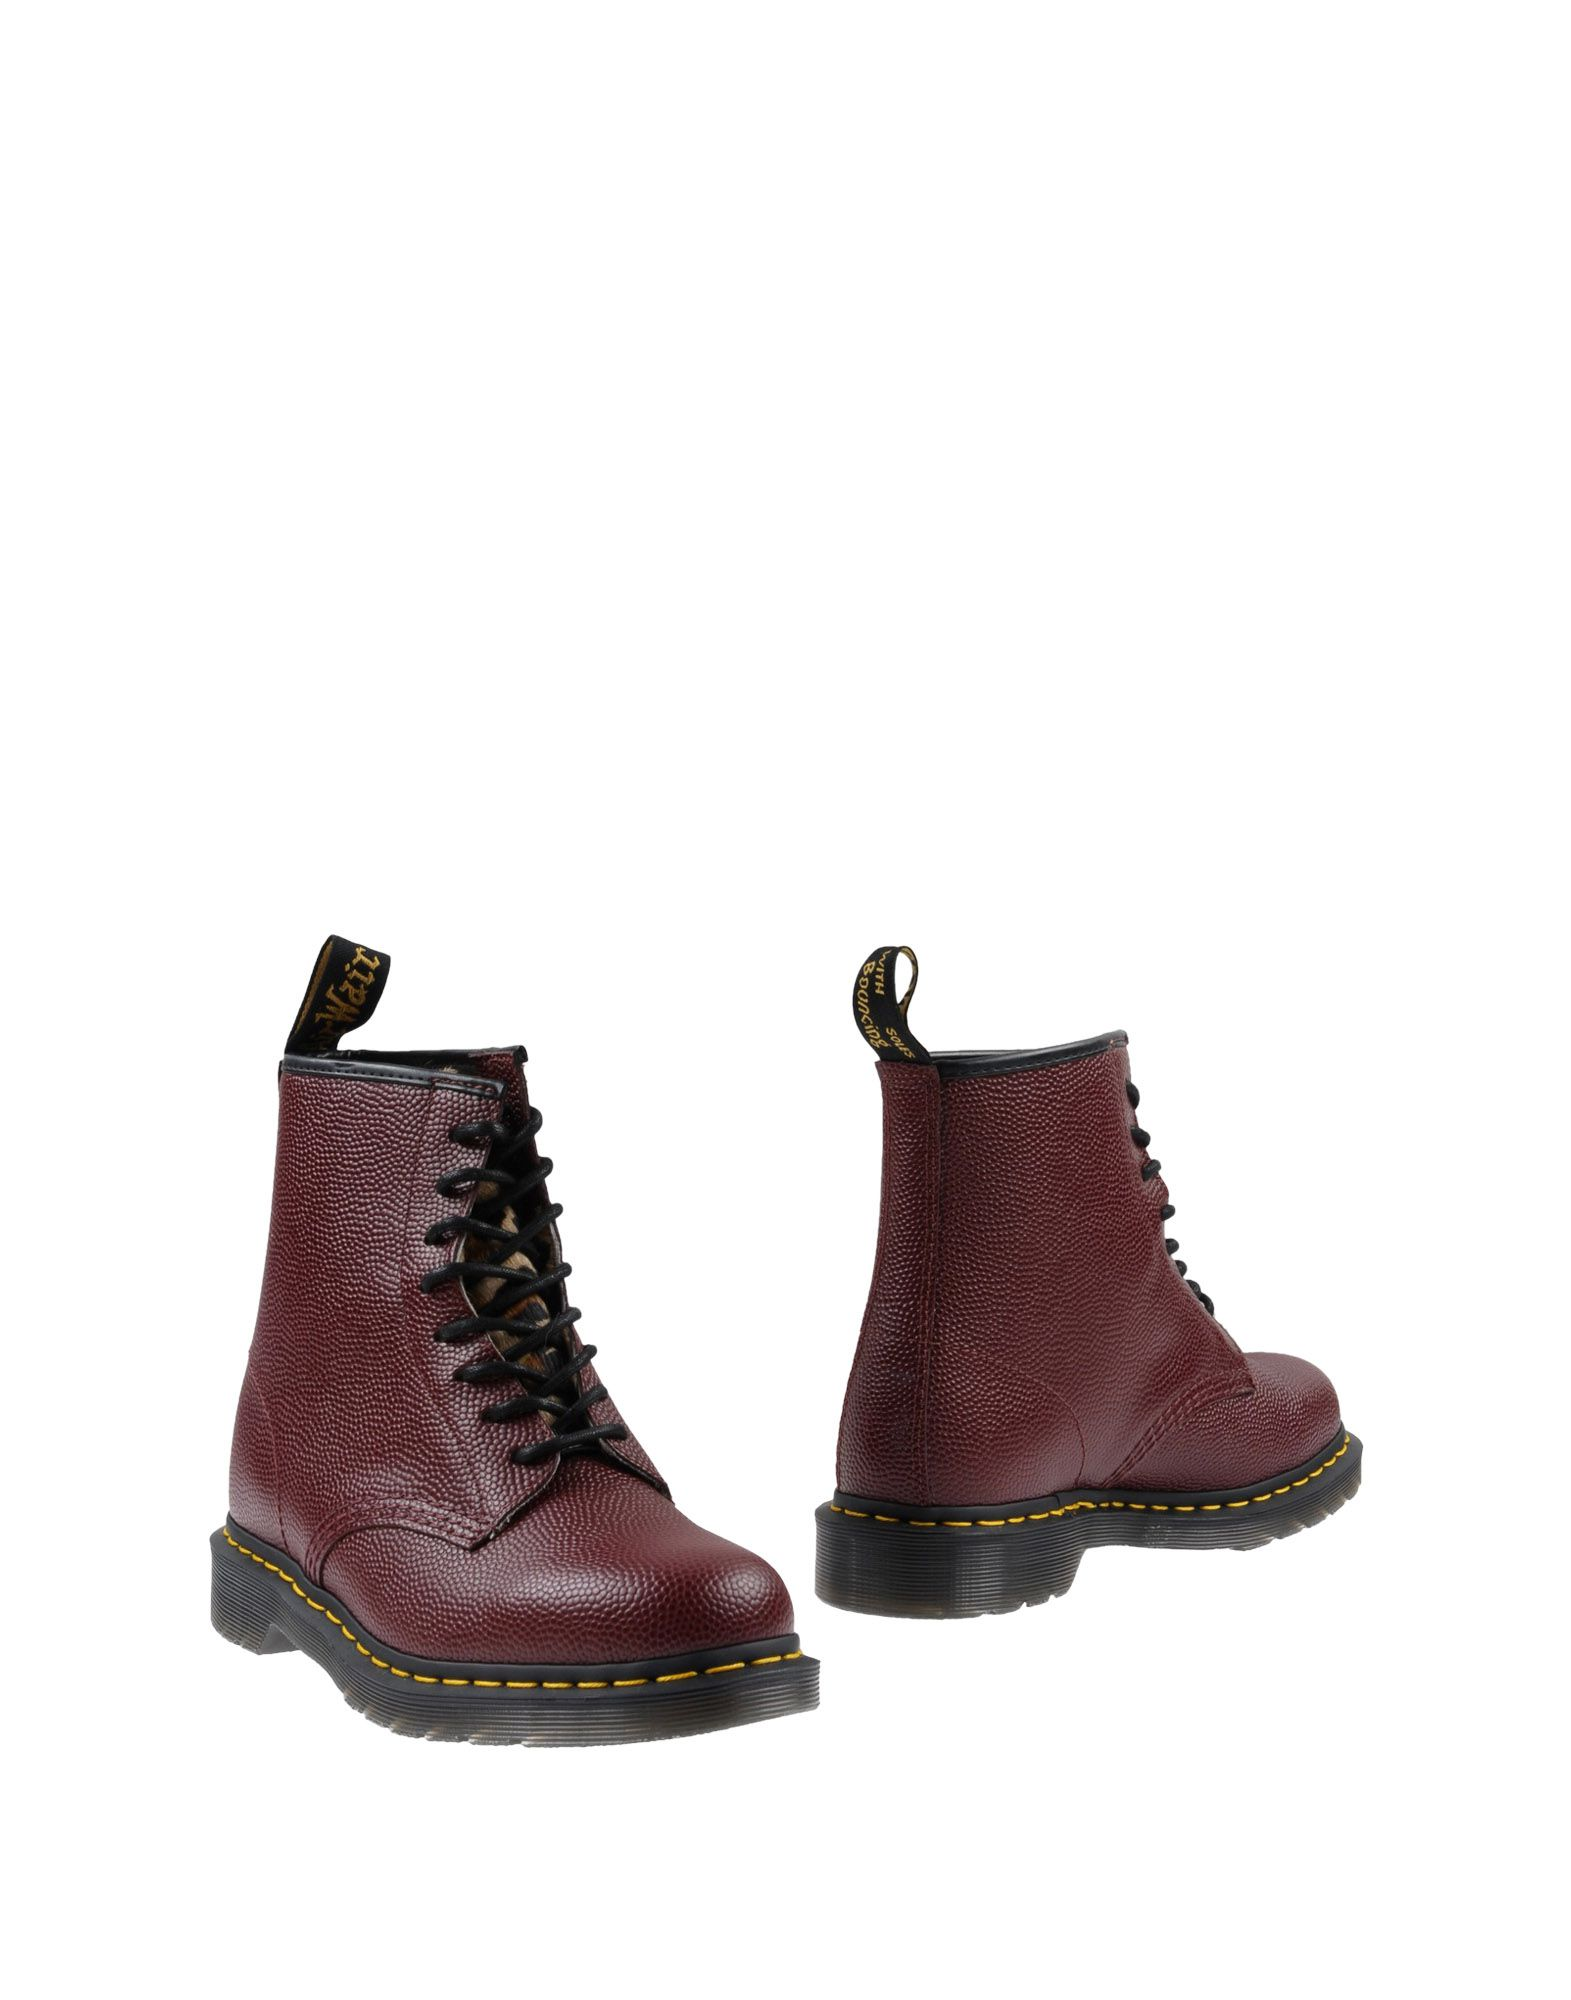 DR. MARTENS for STUSSY Полусапоги и высокие ботинки ботинки dr martens